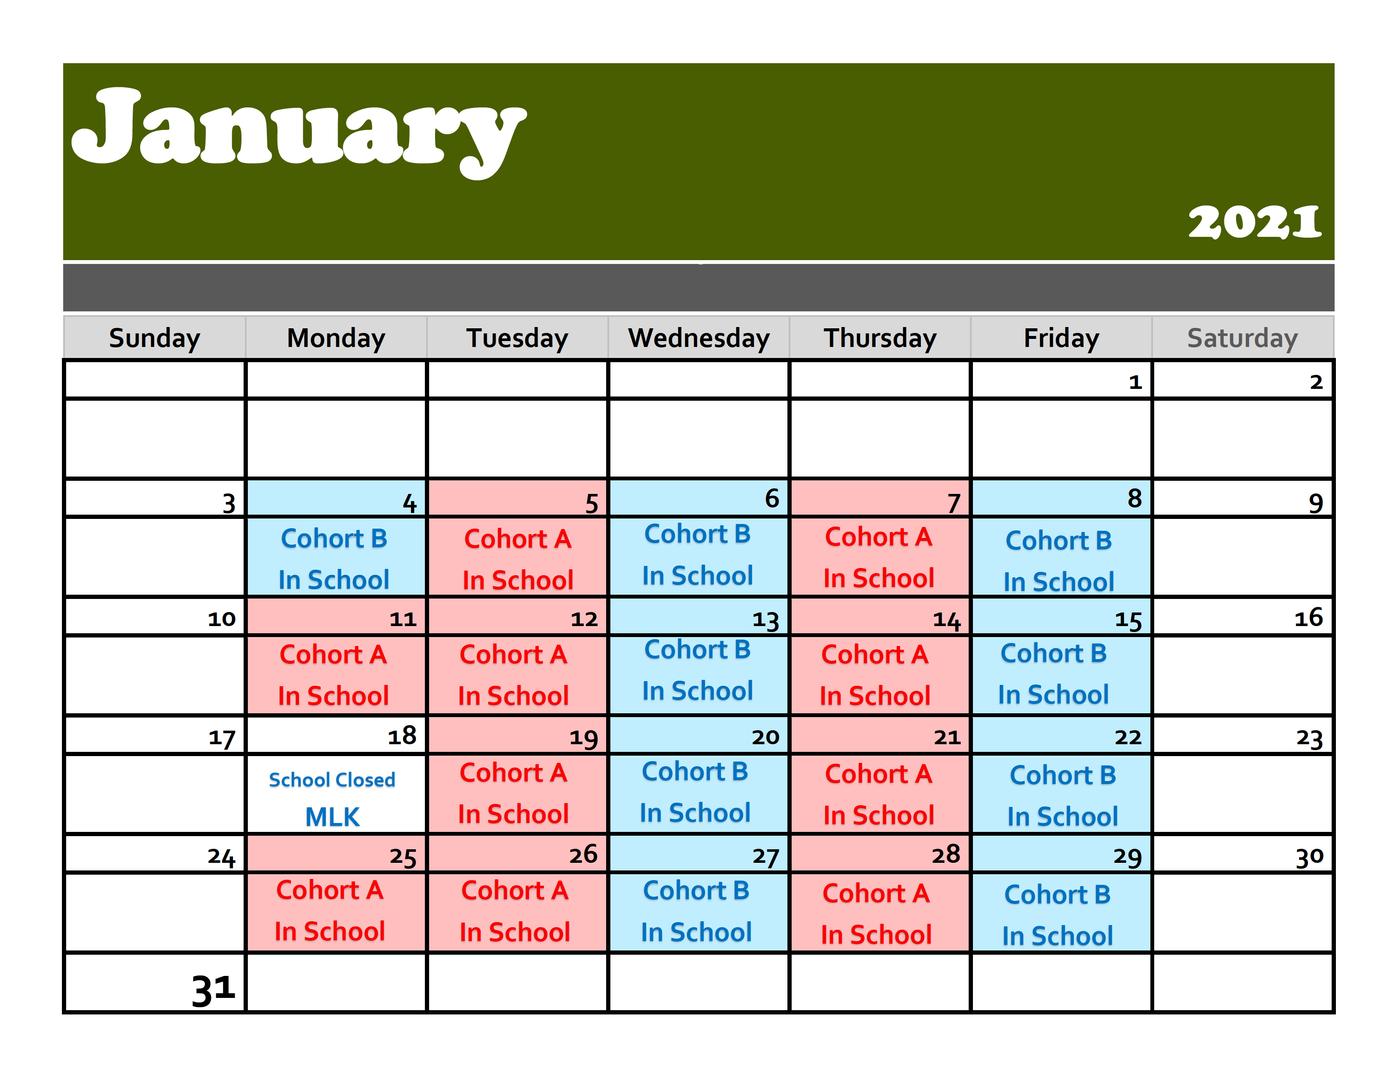 January 2021 Cohort Schedule